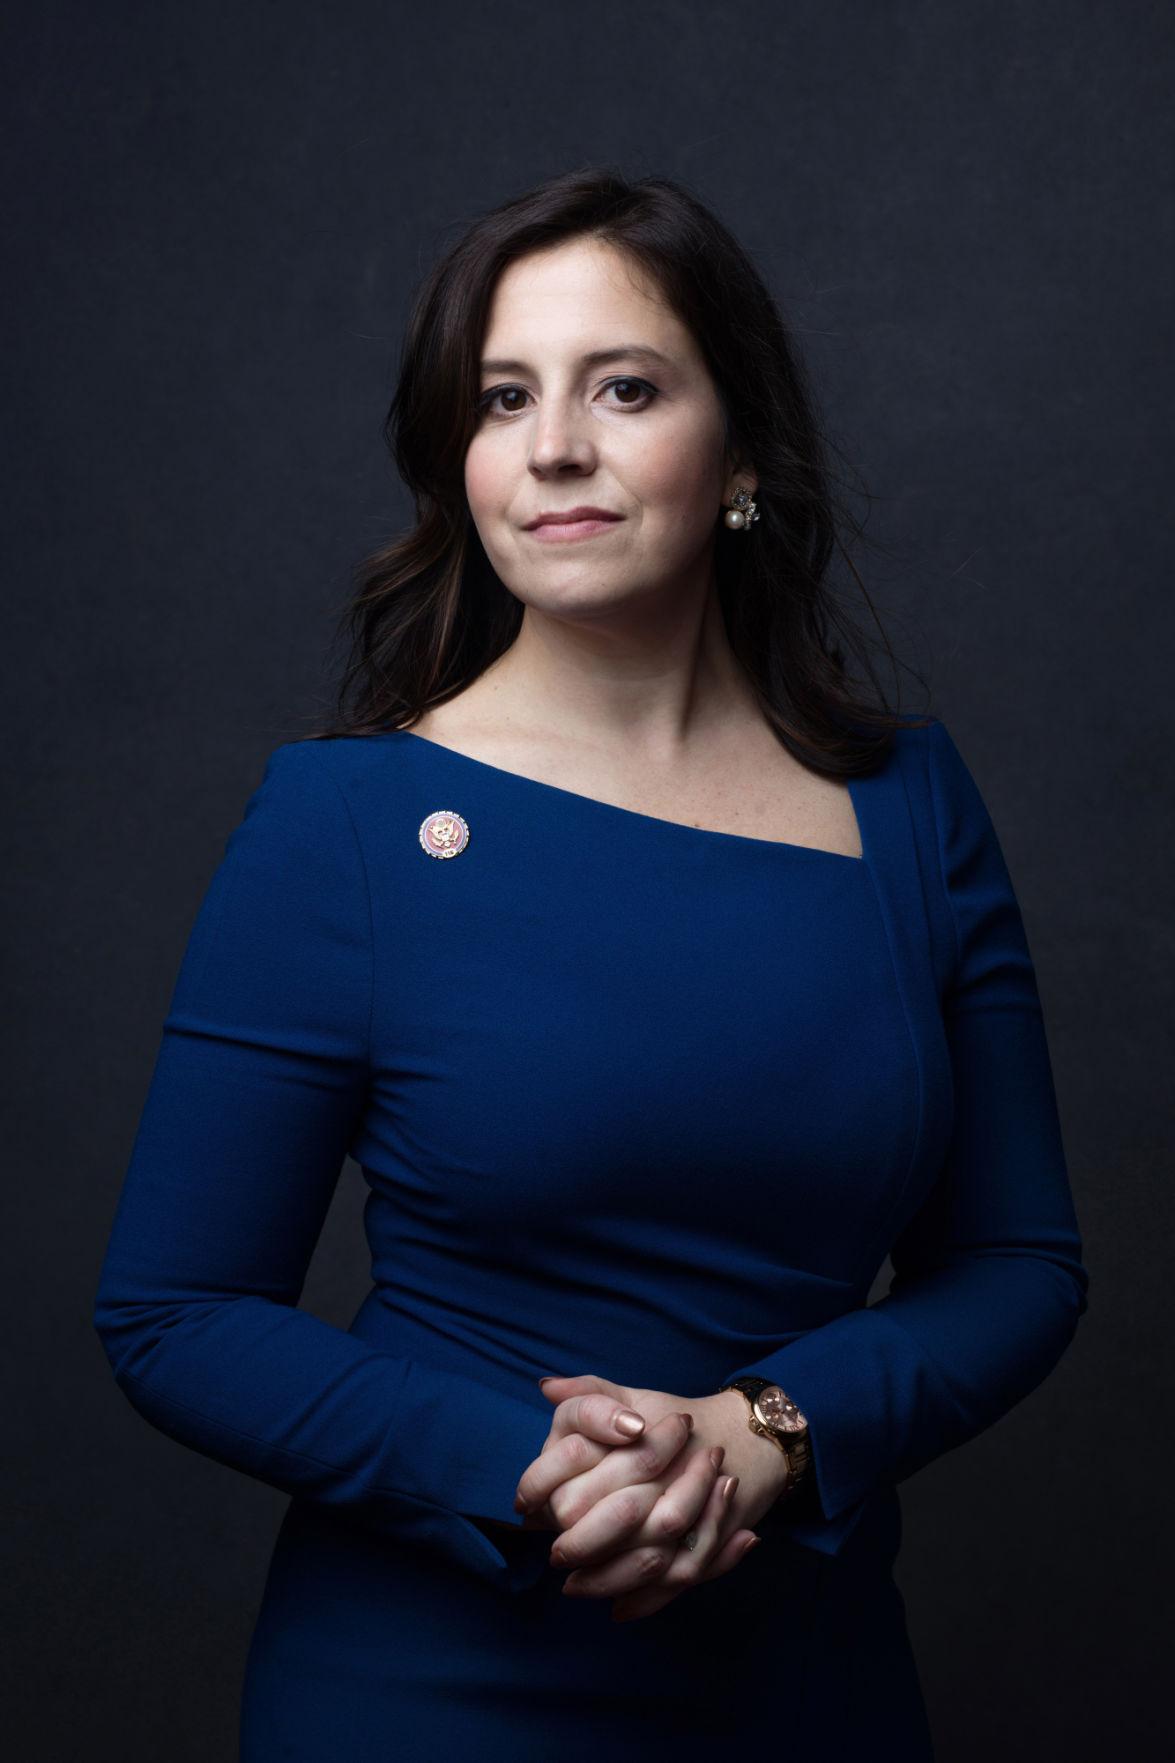 GOP: Cuomo's reforms 'soft on crime'